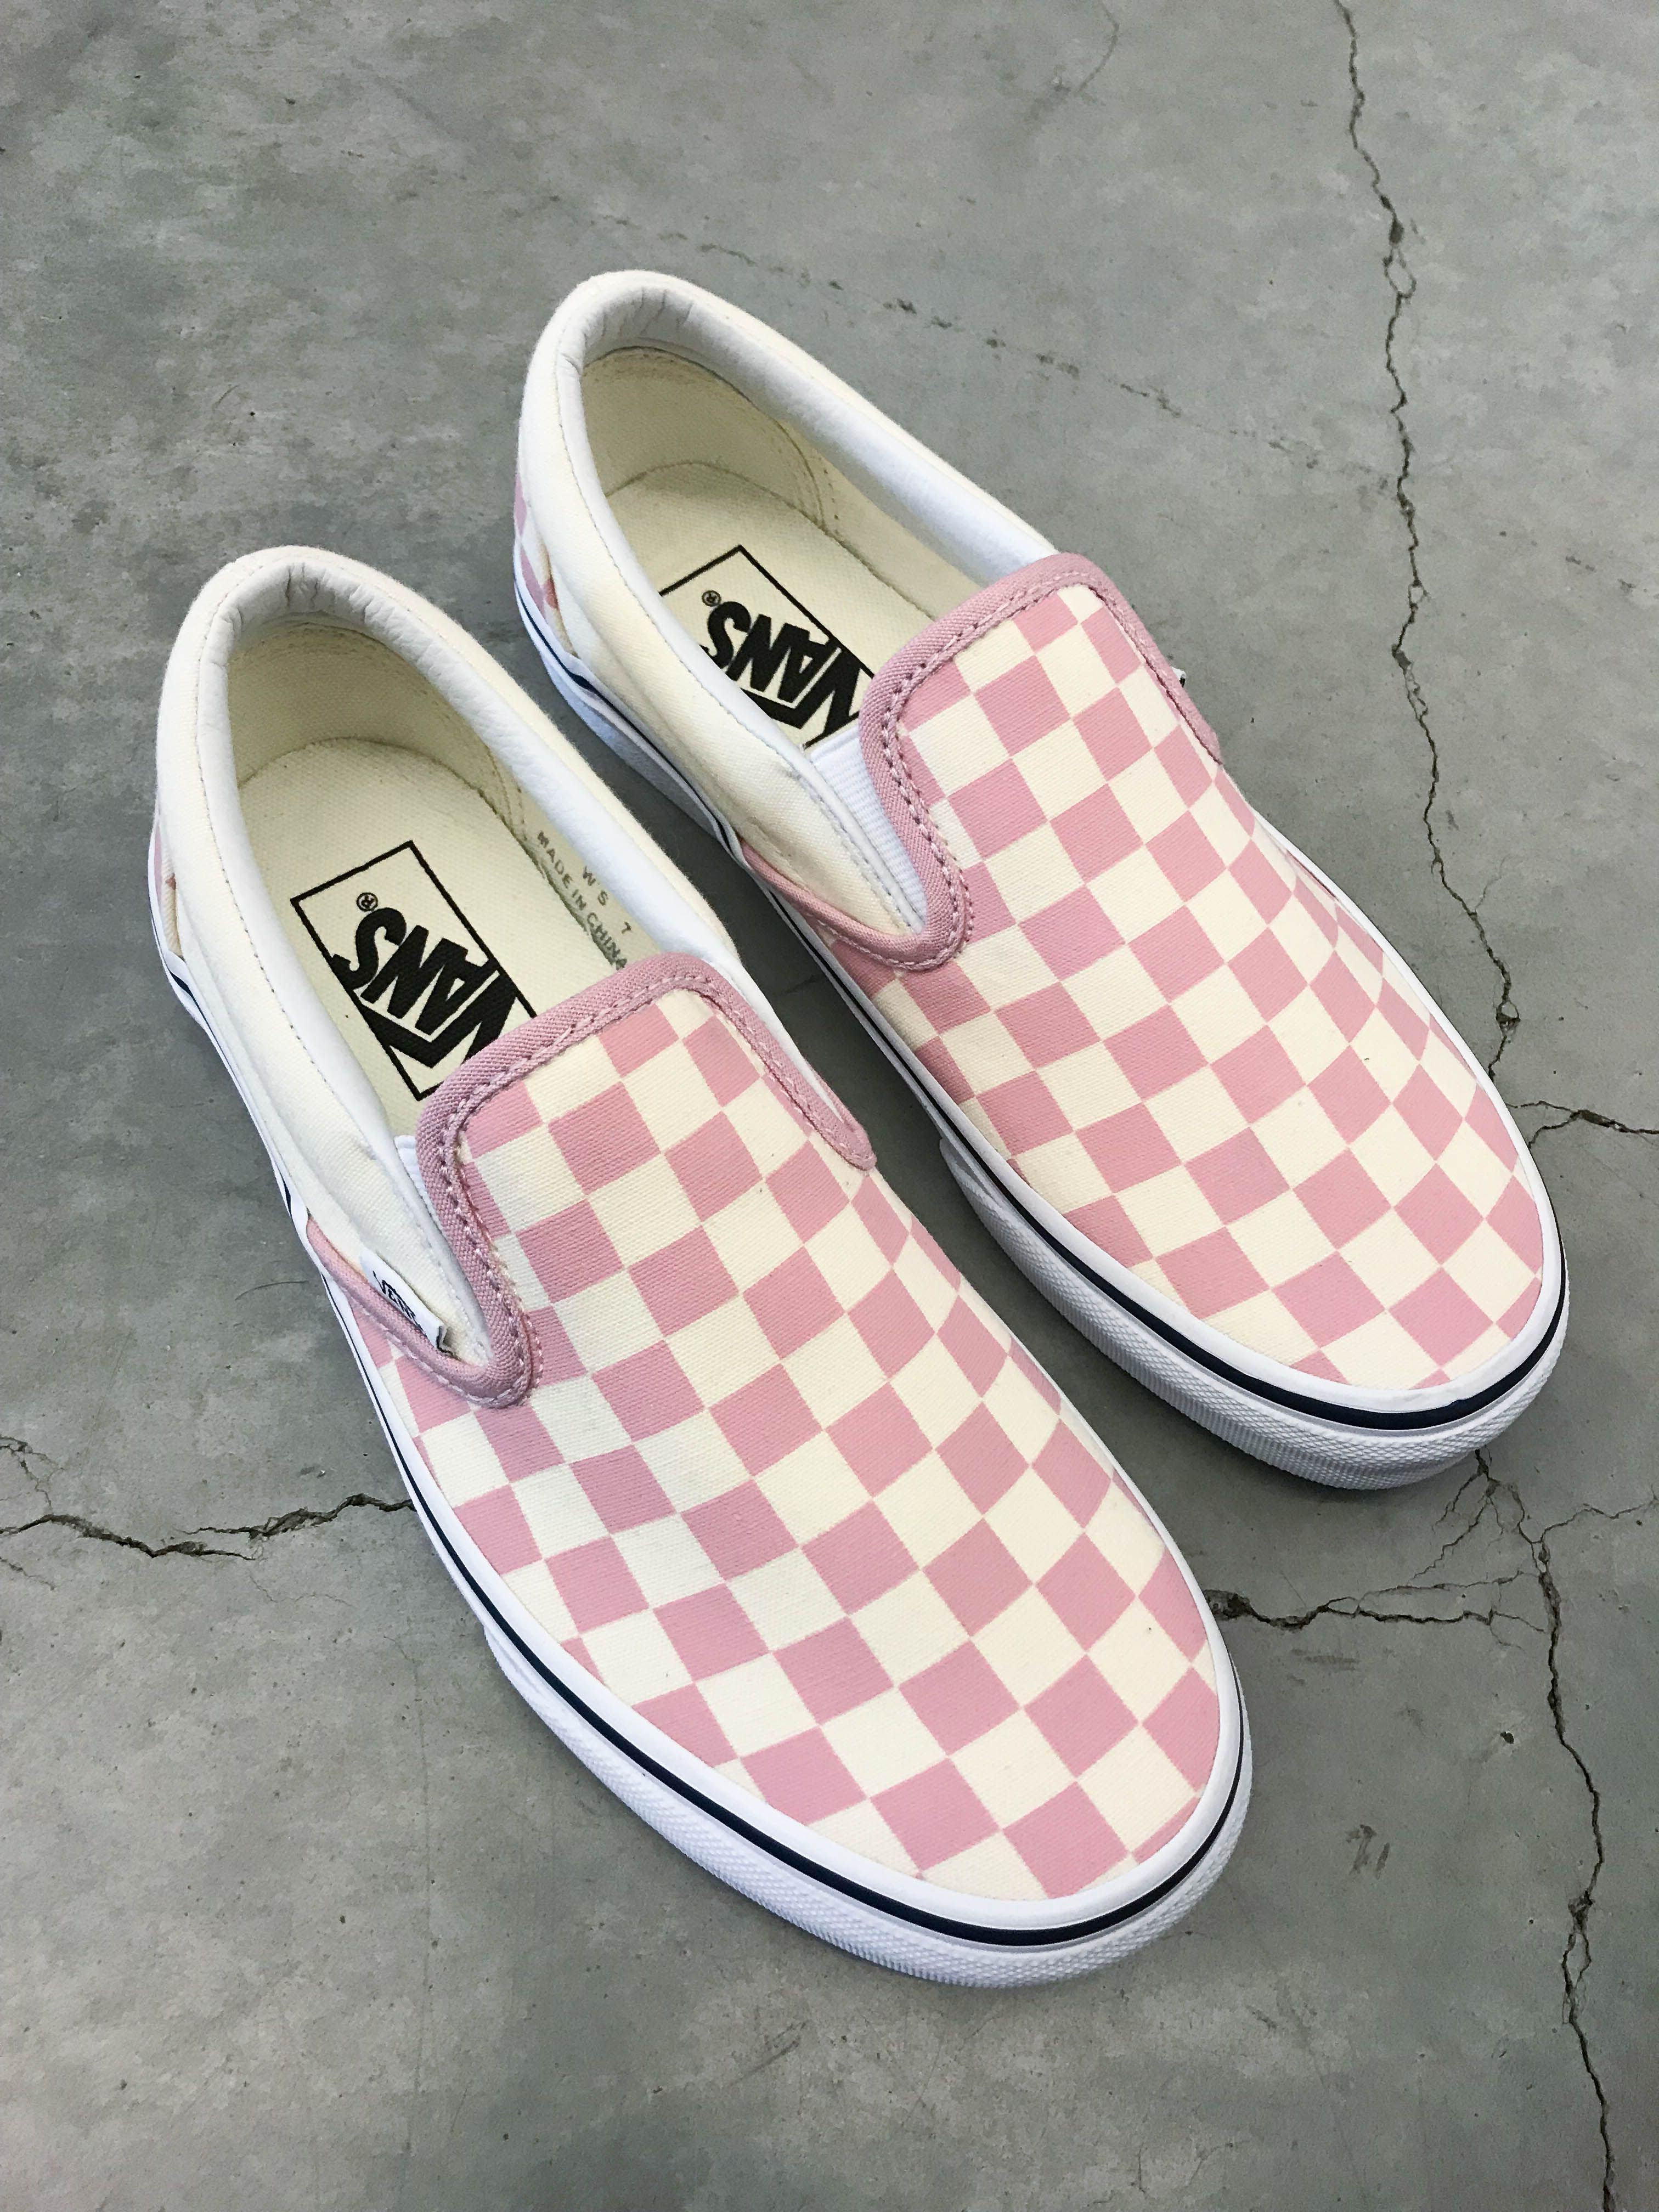 White Checkered Skate Shoes